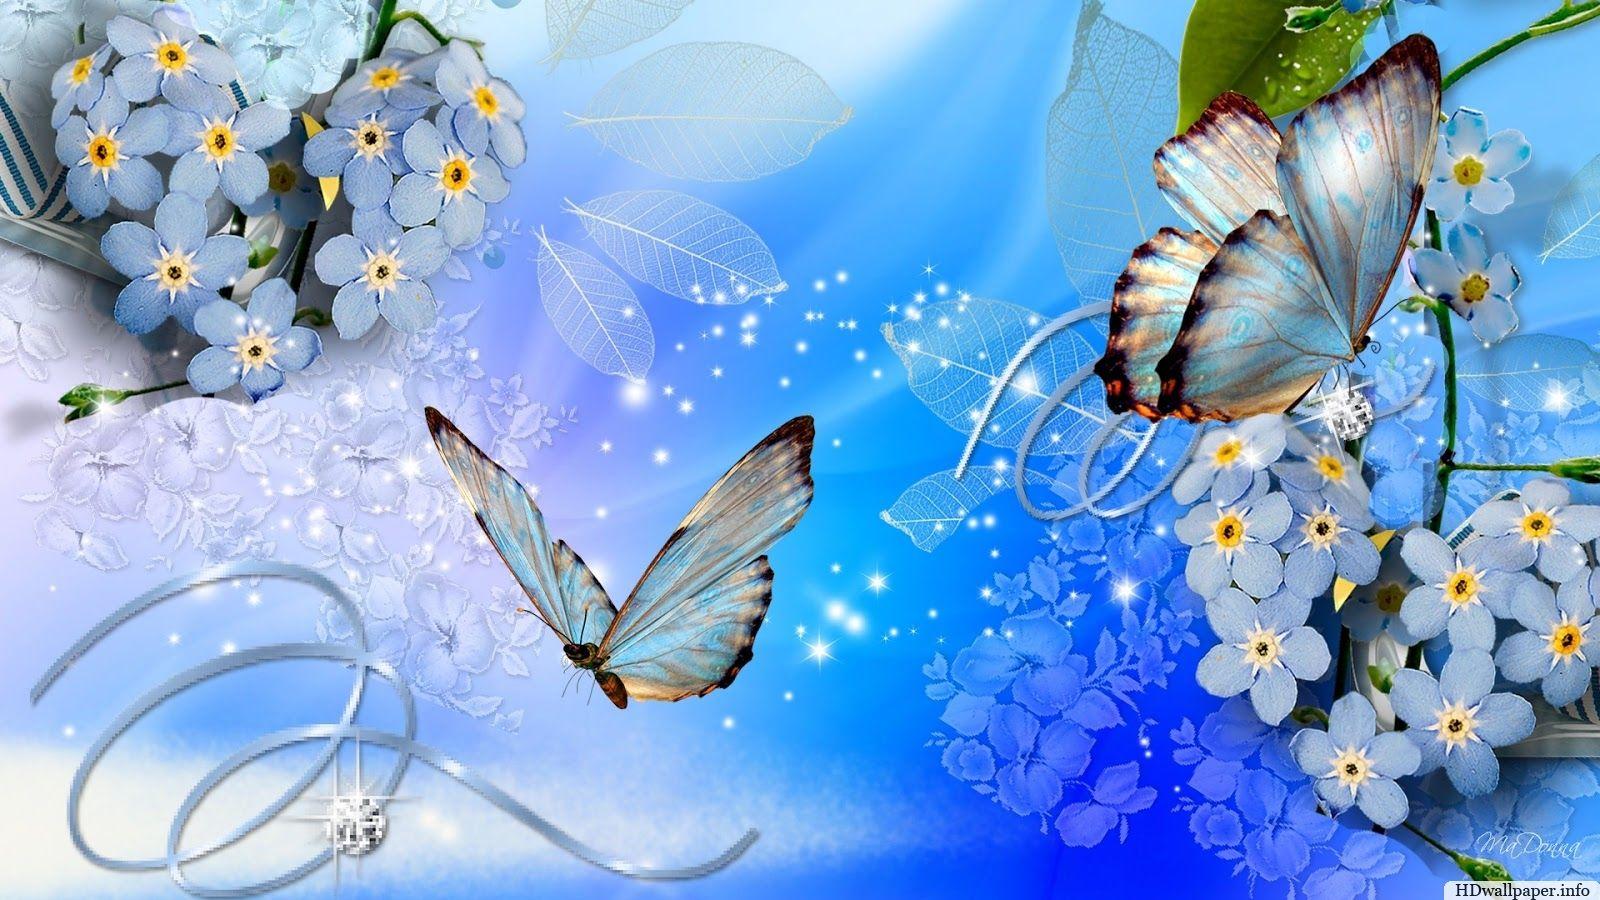 Full Screen Desktop Wallpaper Free Download http